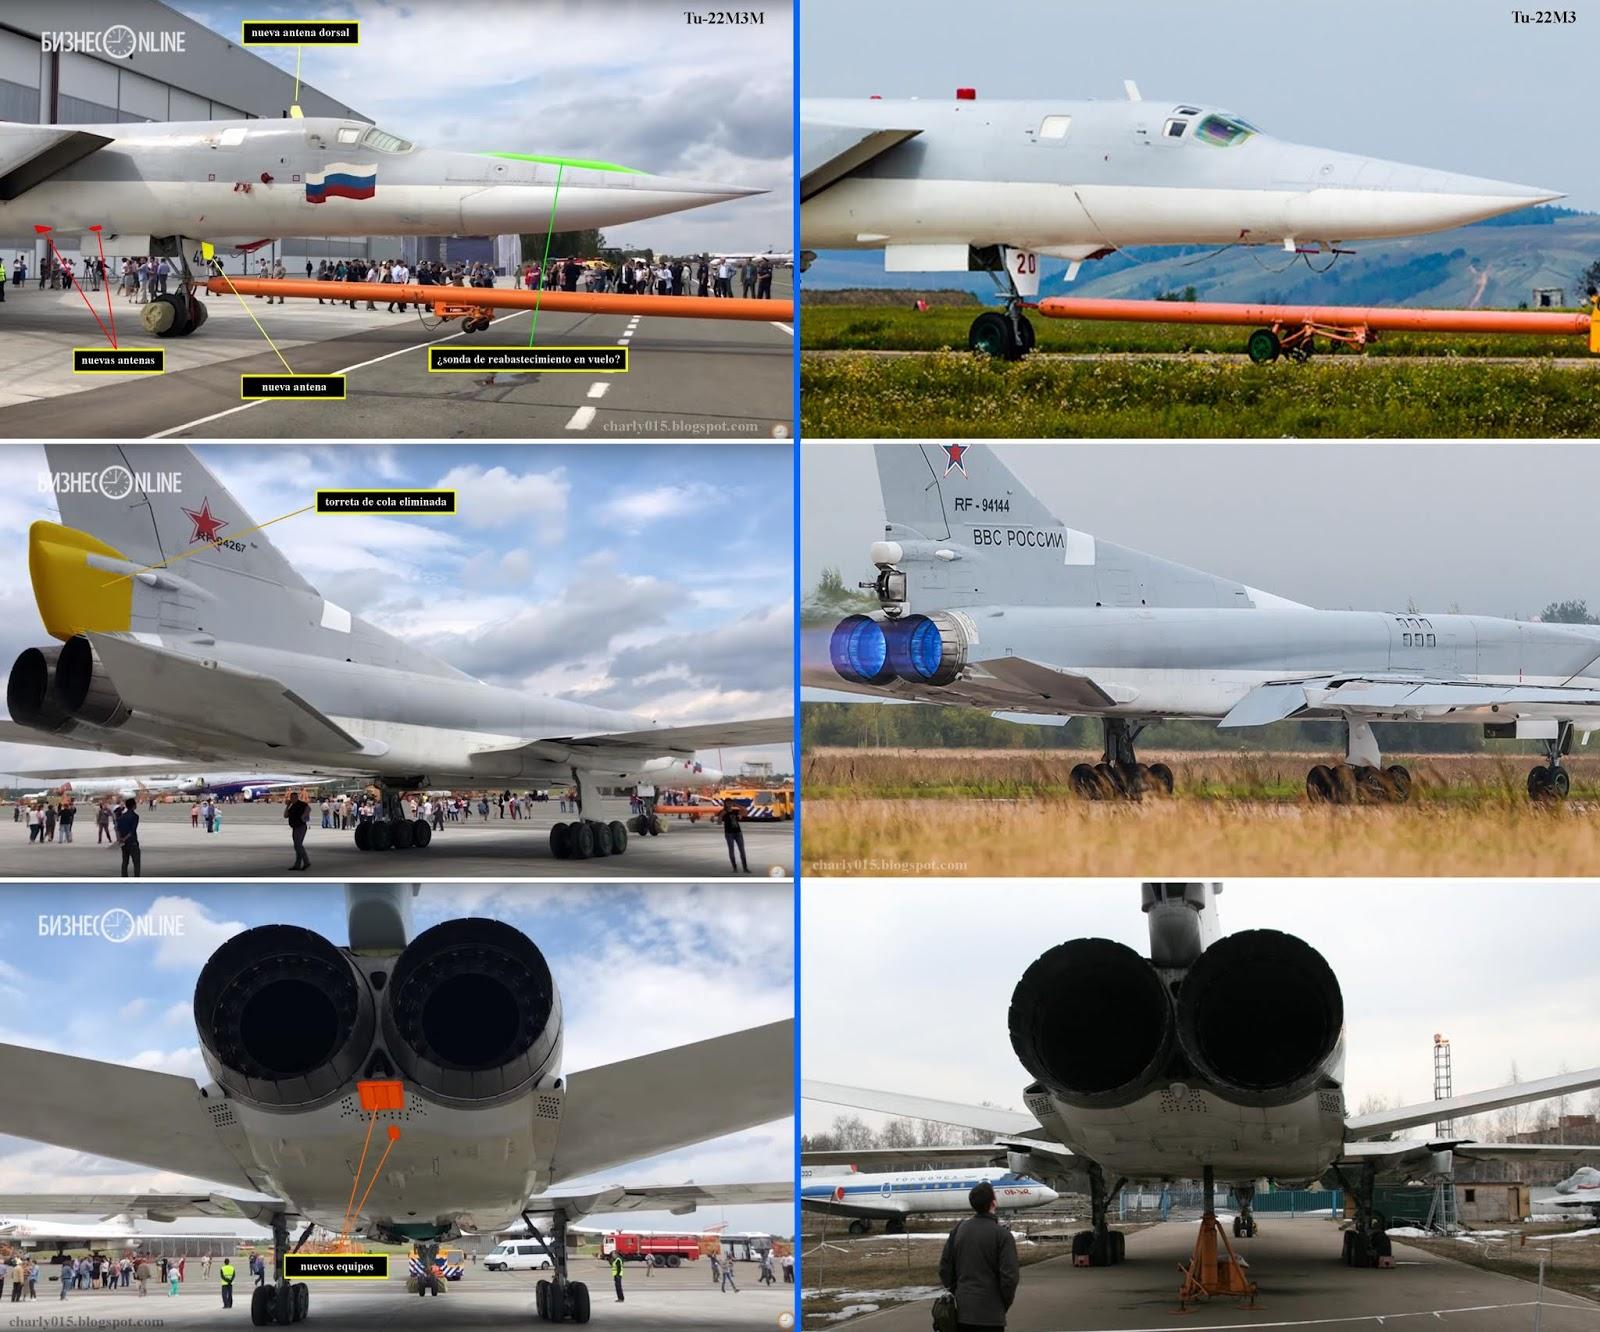 tu-22m3m_vs_tu-22m3.jpg